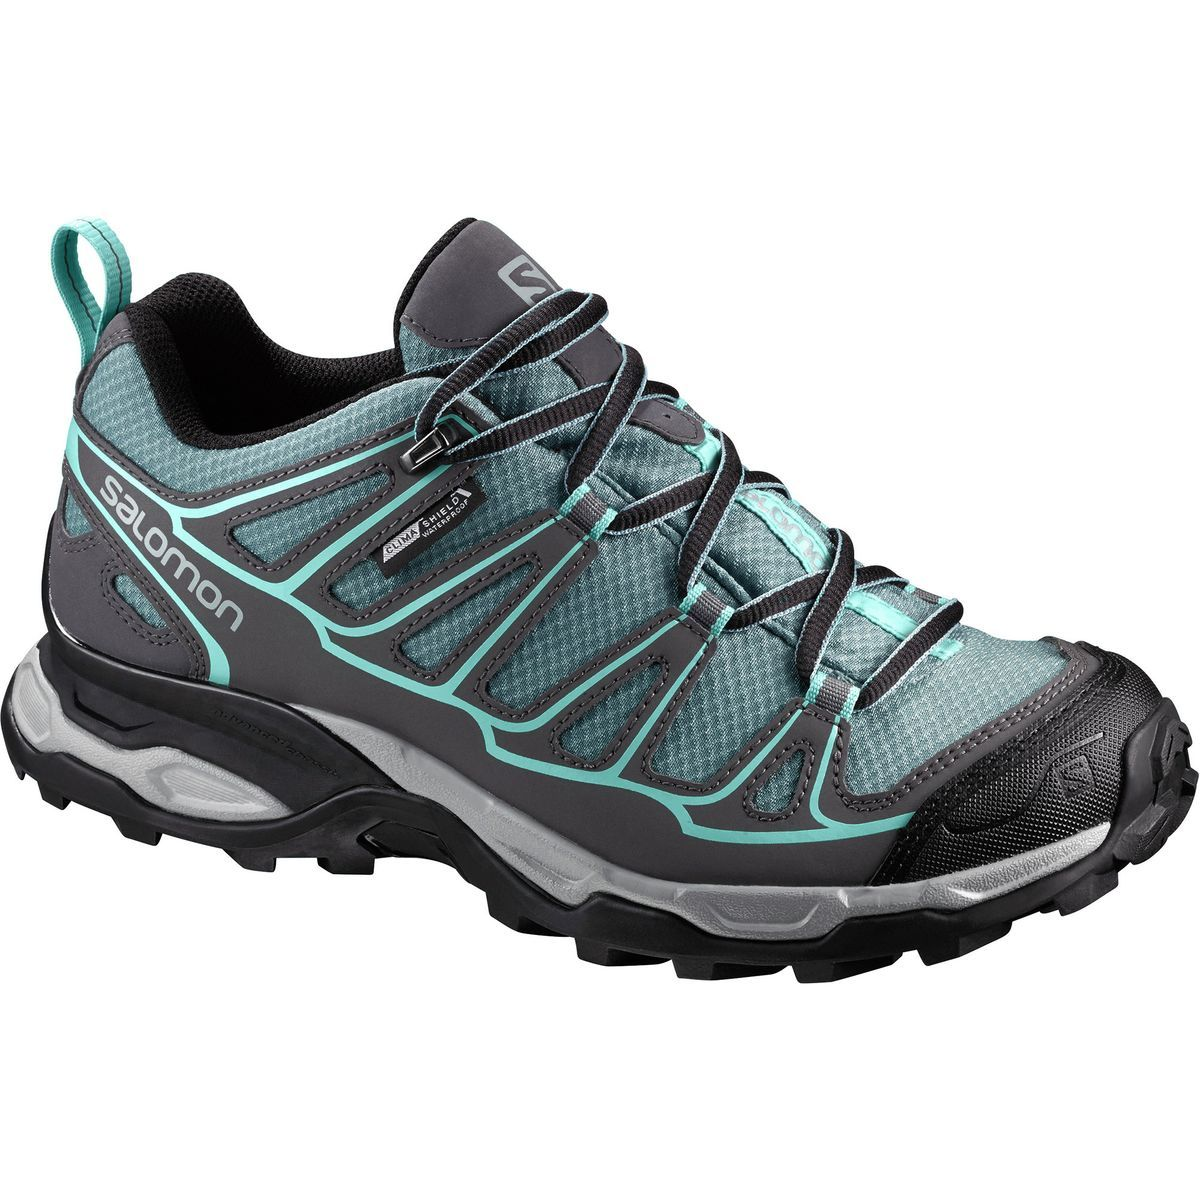 Salomon X Ultra Prime CS WP Hiking Shoe Women's in 2020